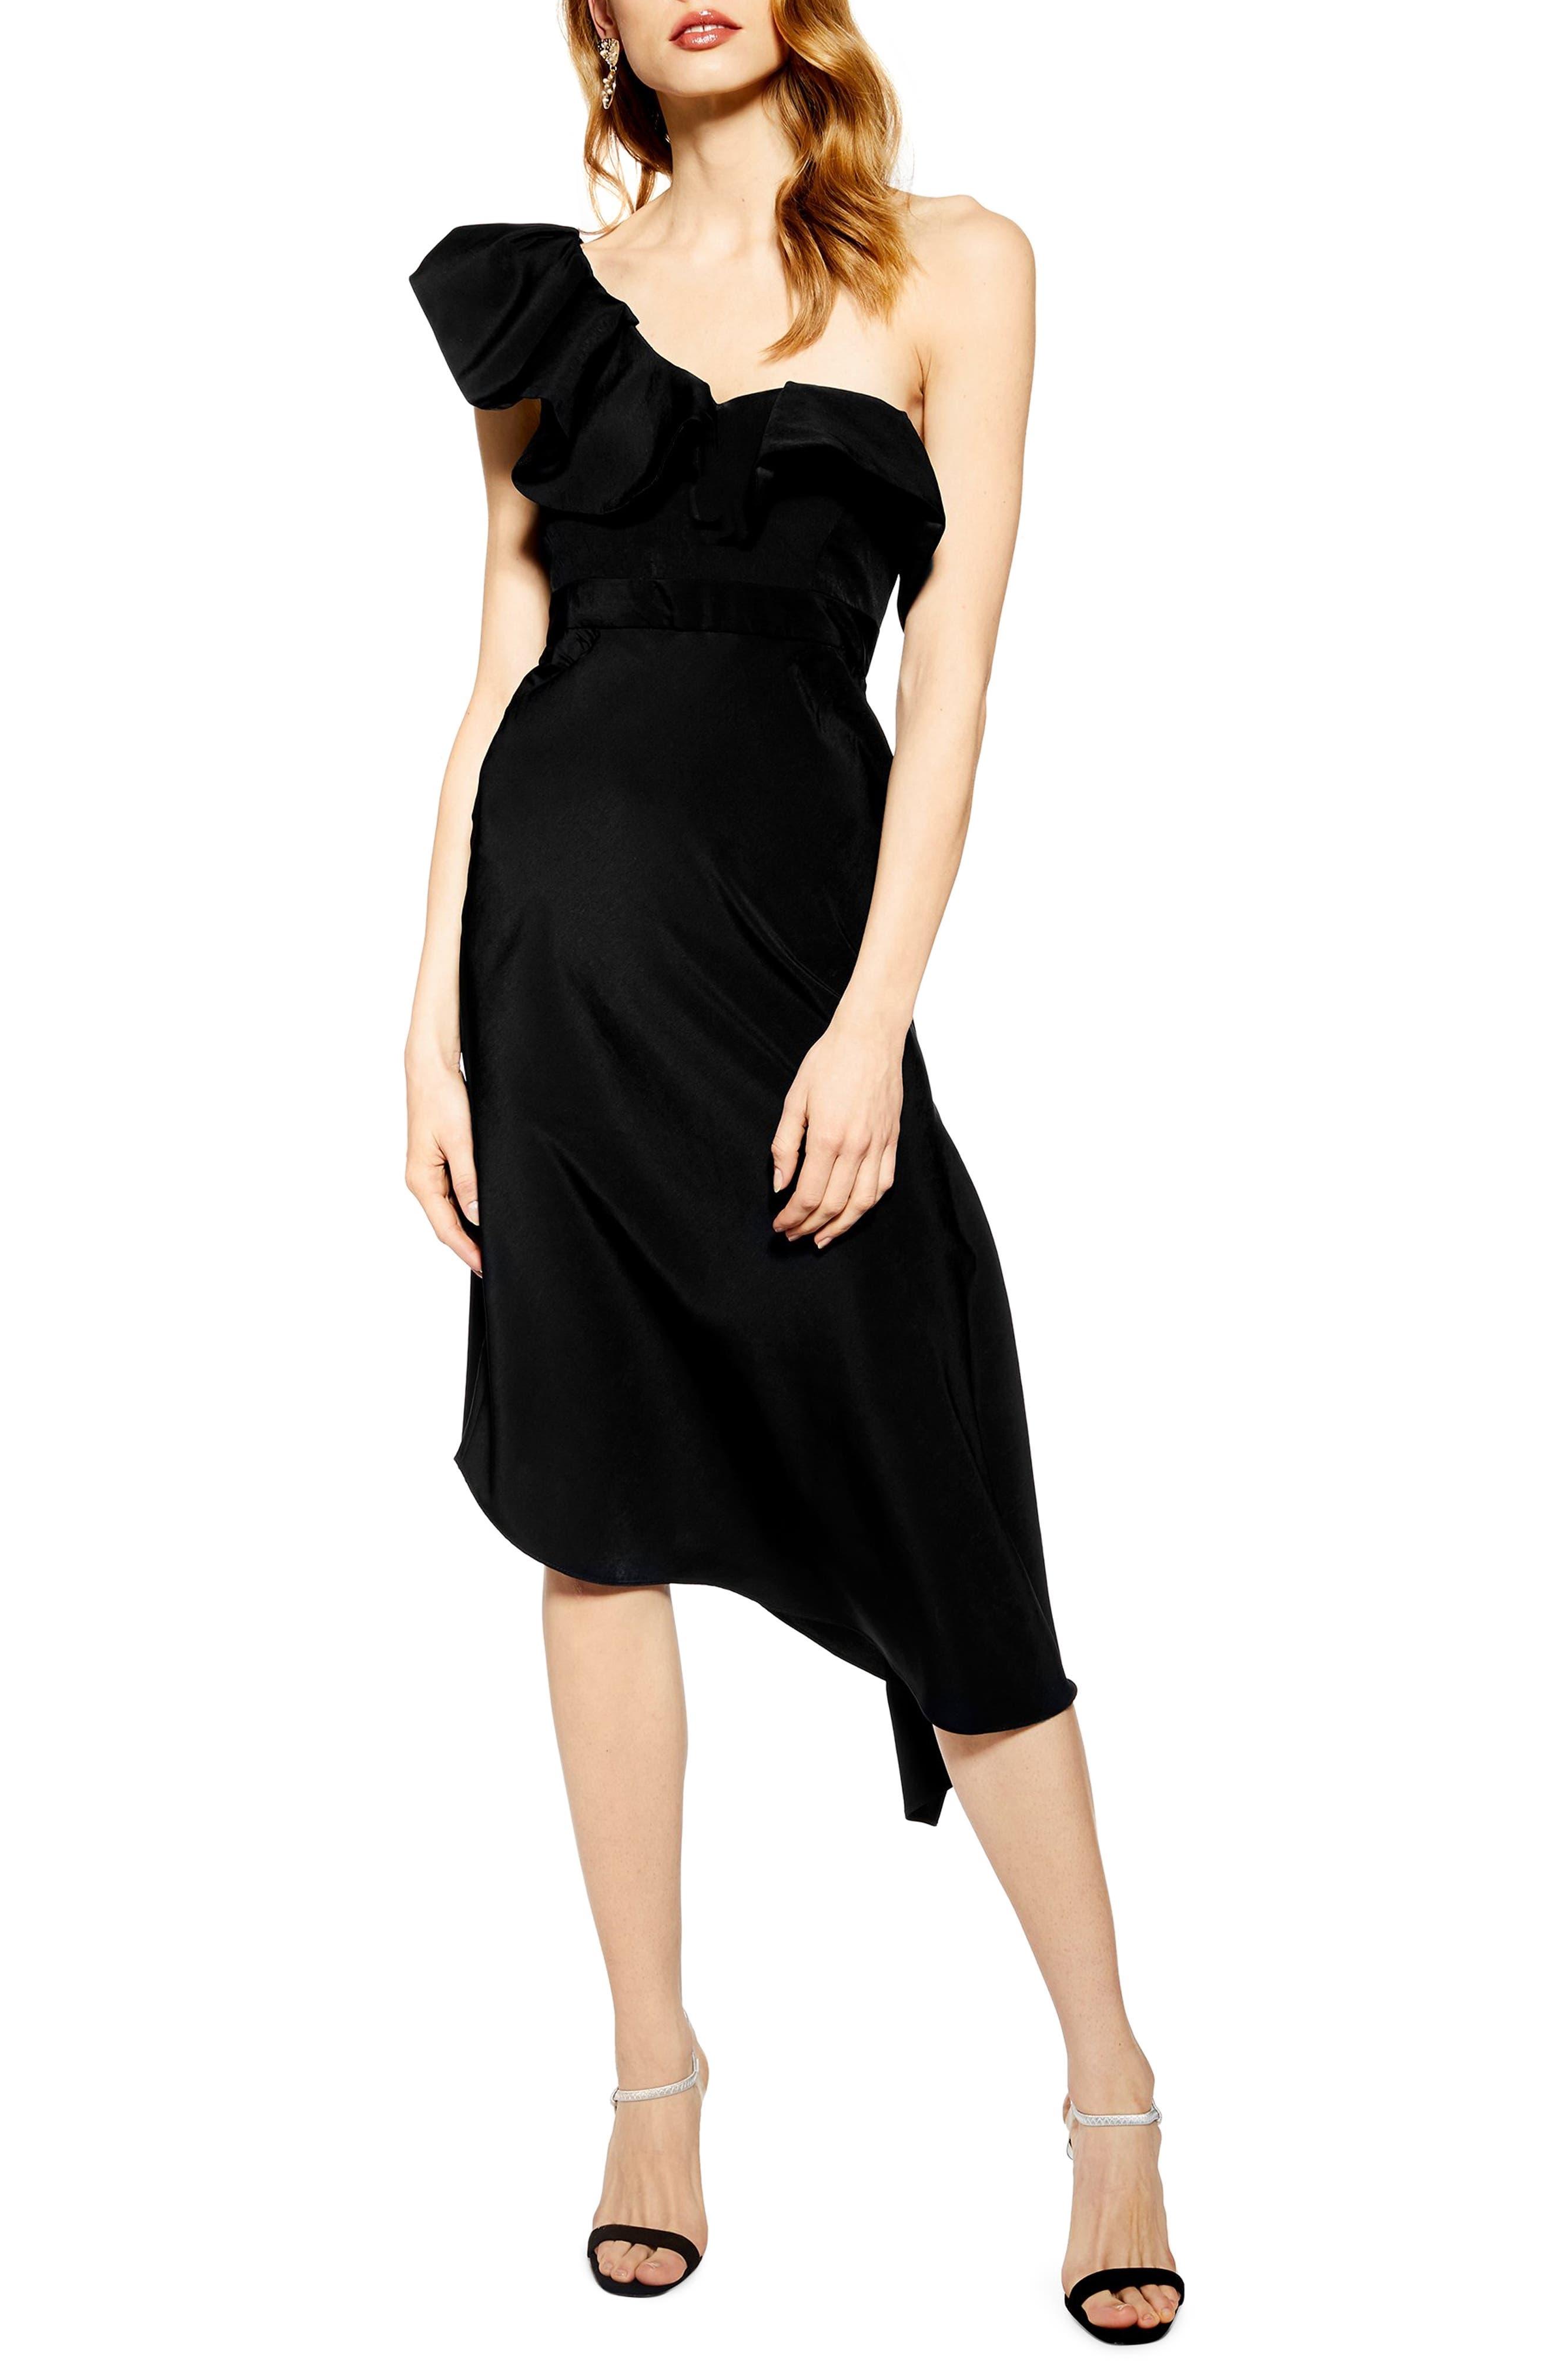 Topshop Ruffle One-Shoulder Midi Dress, US (fits like 0) - Black